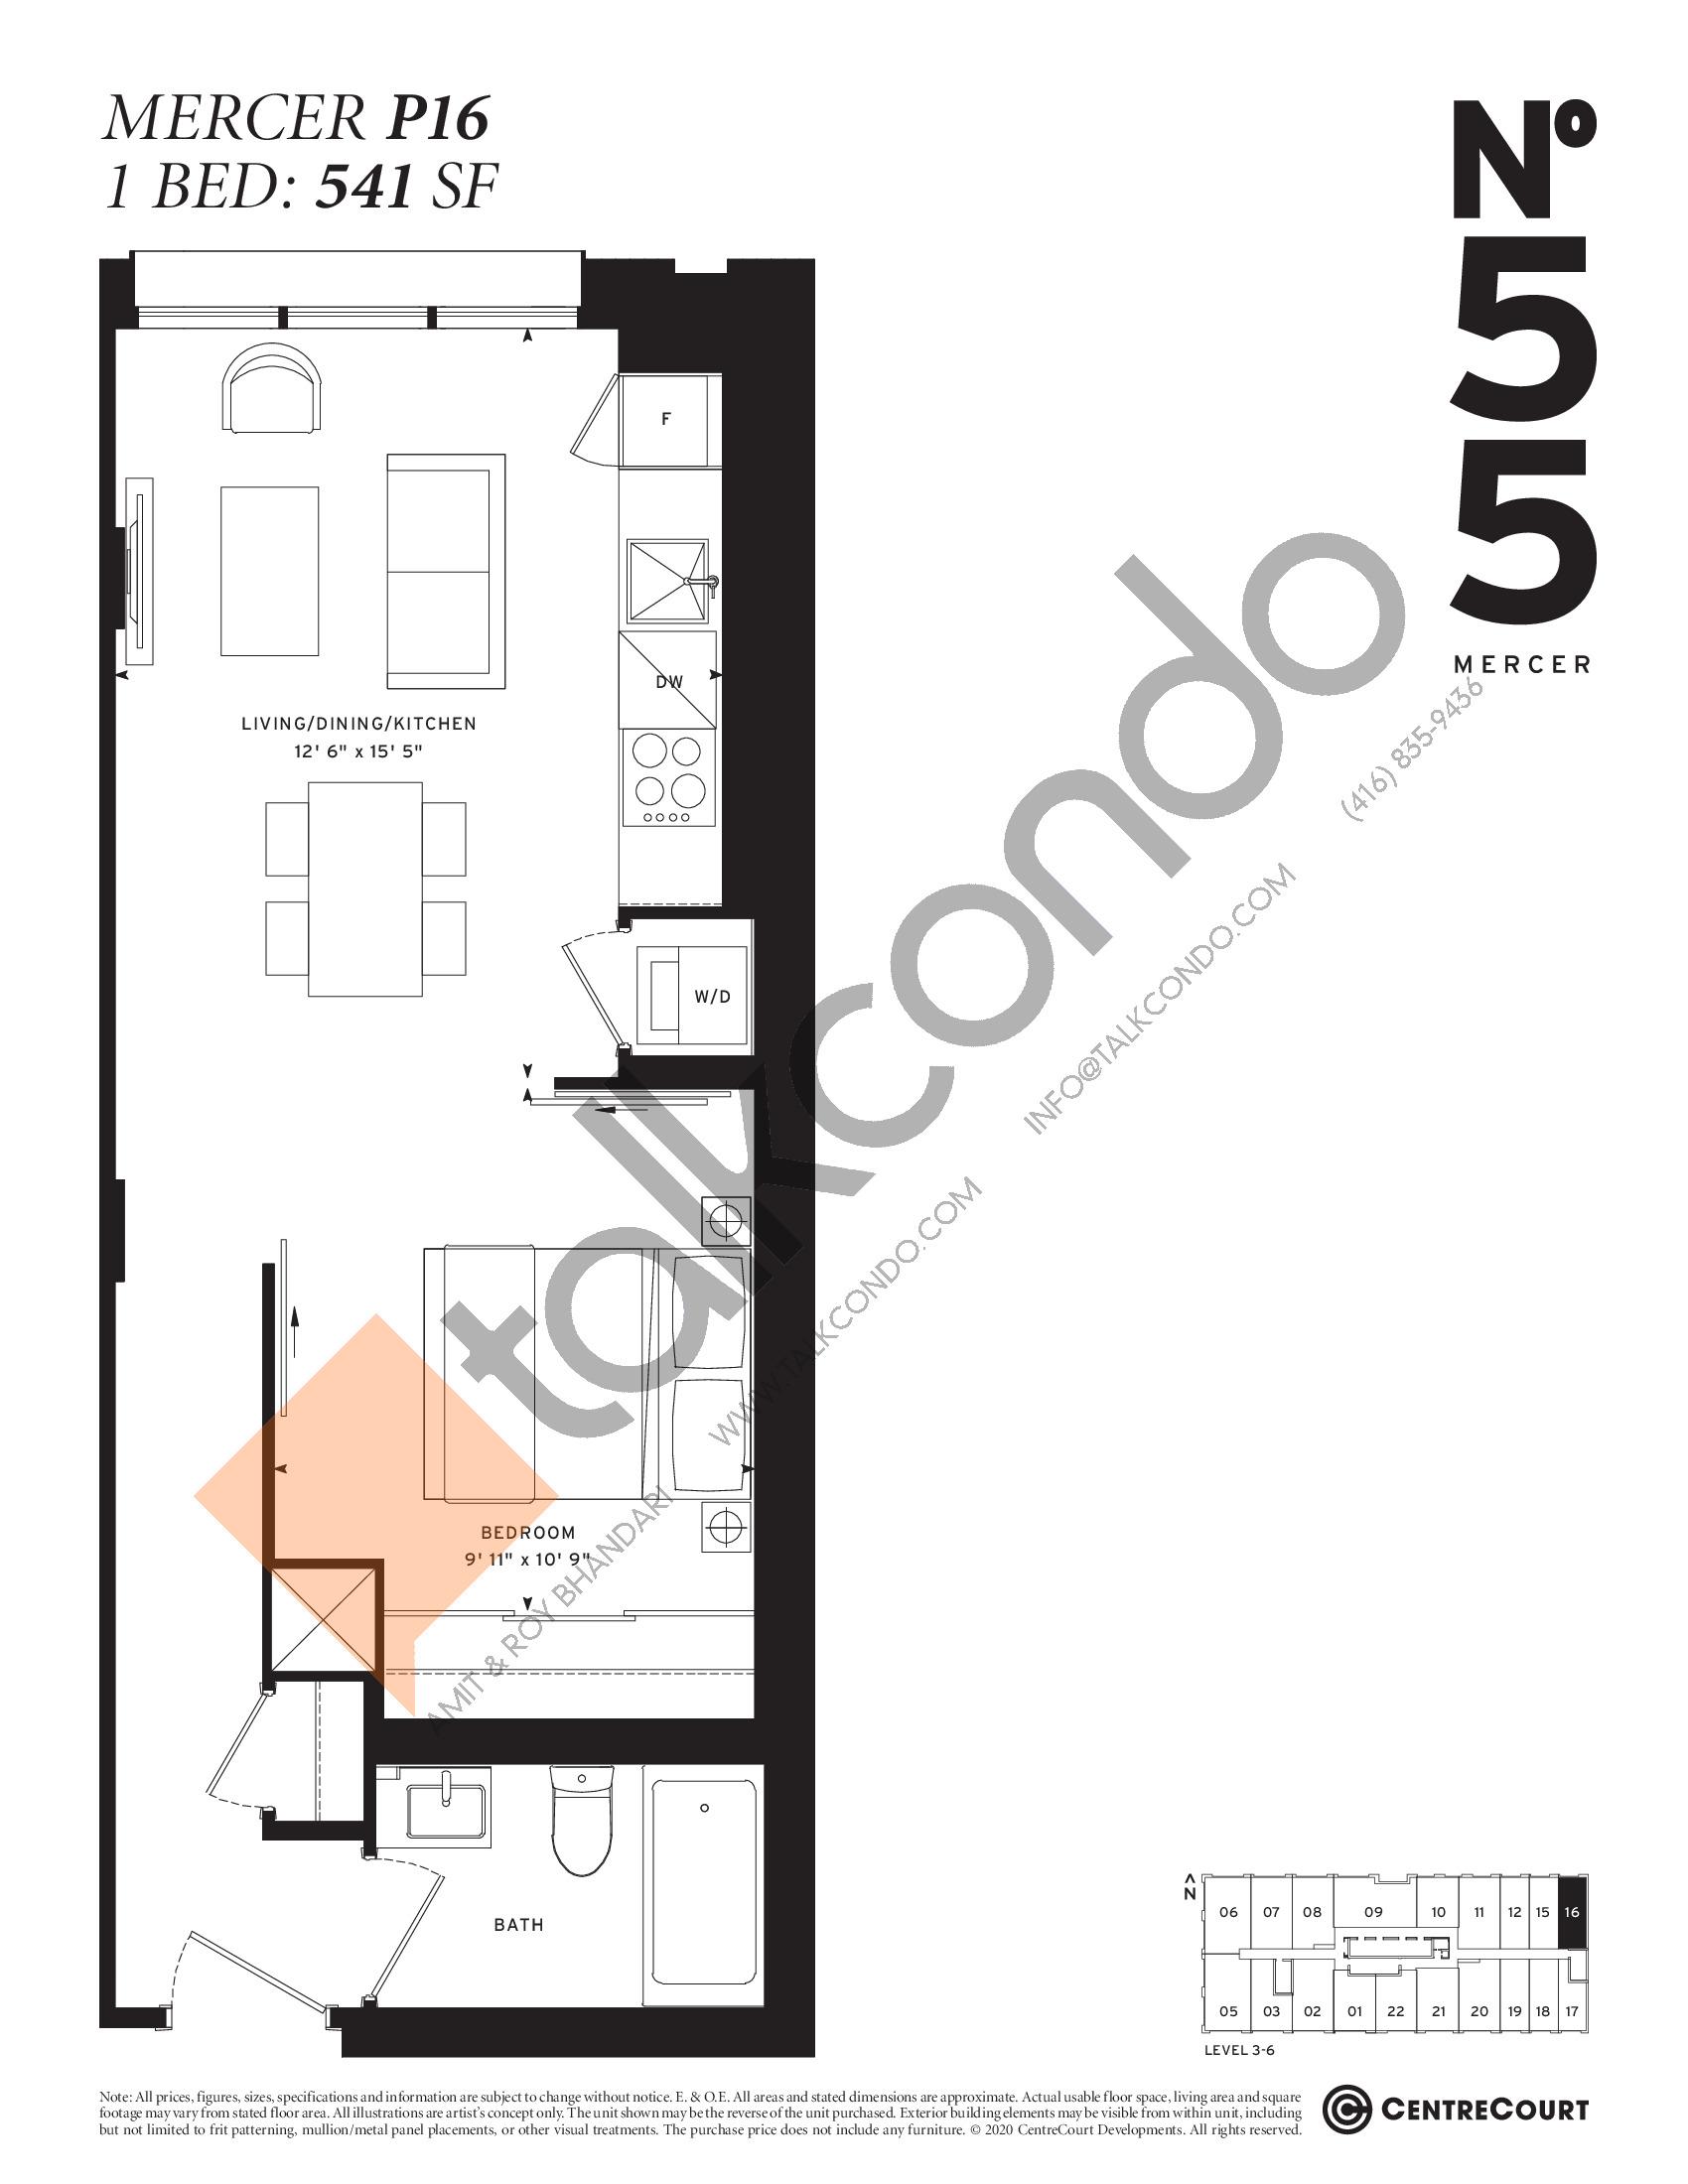 Mercer P16 Floor Plan at No. 55 Mercer Condos - 541 sq.ft